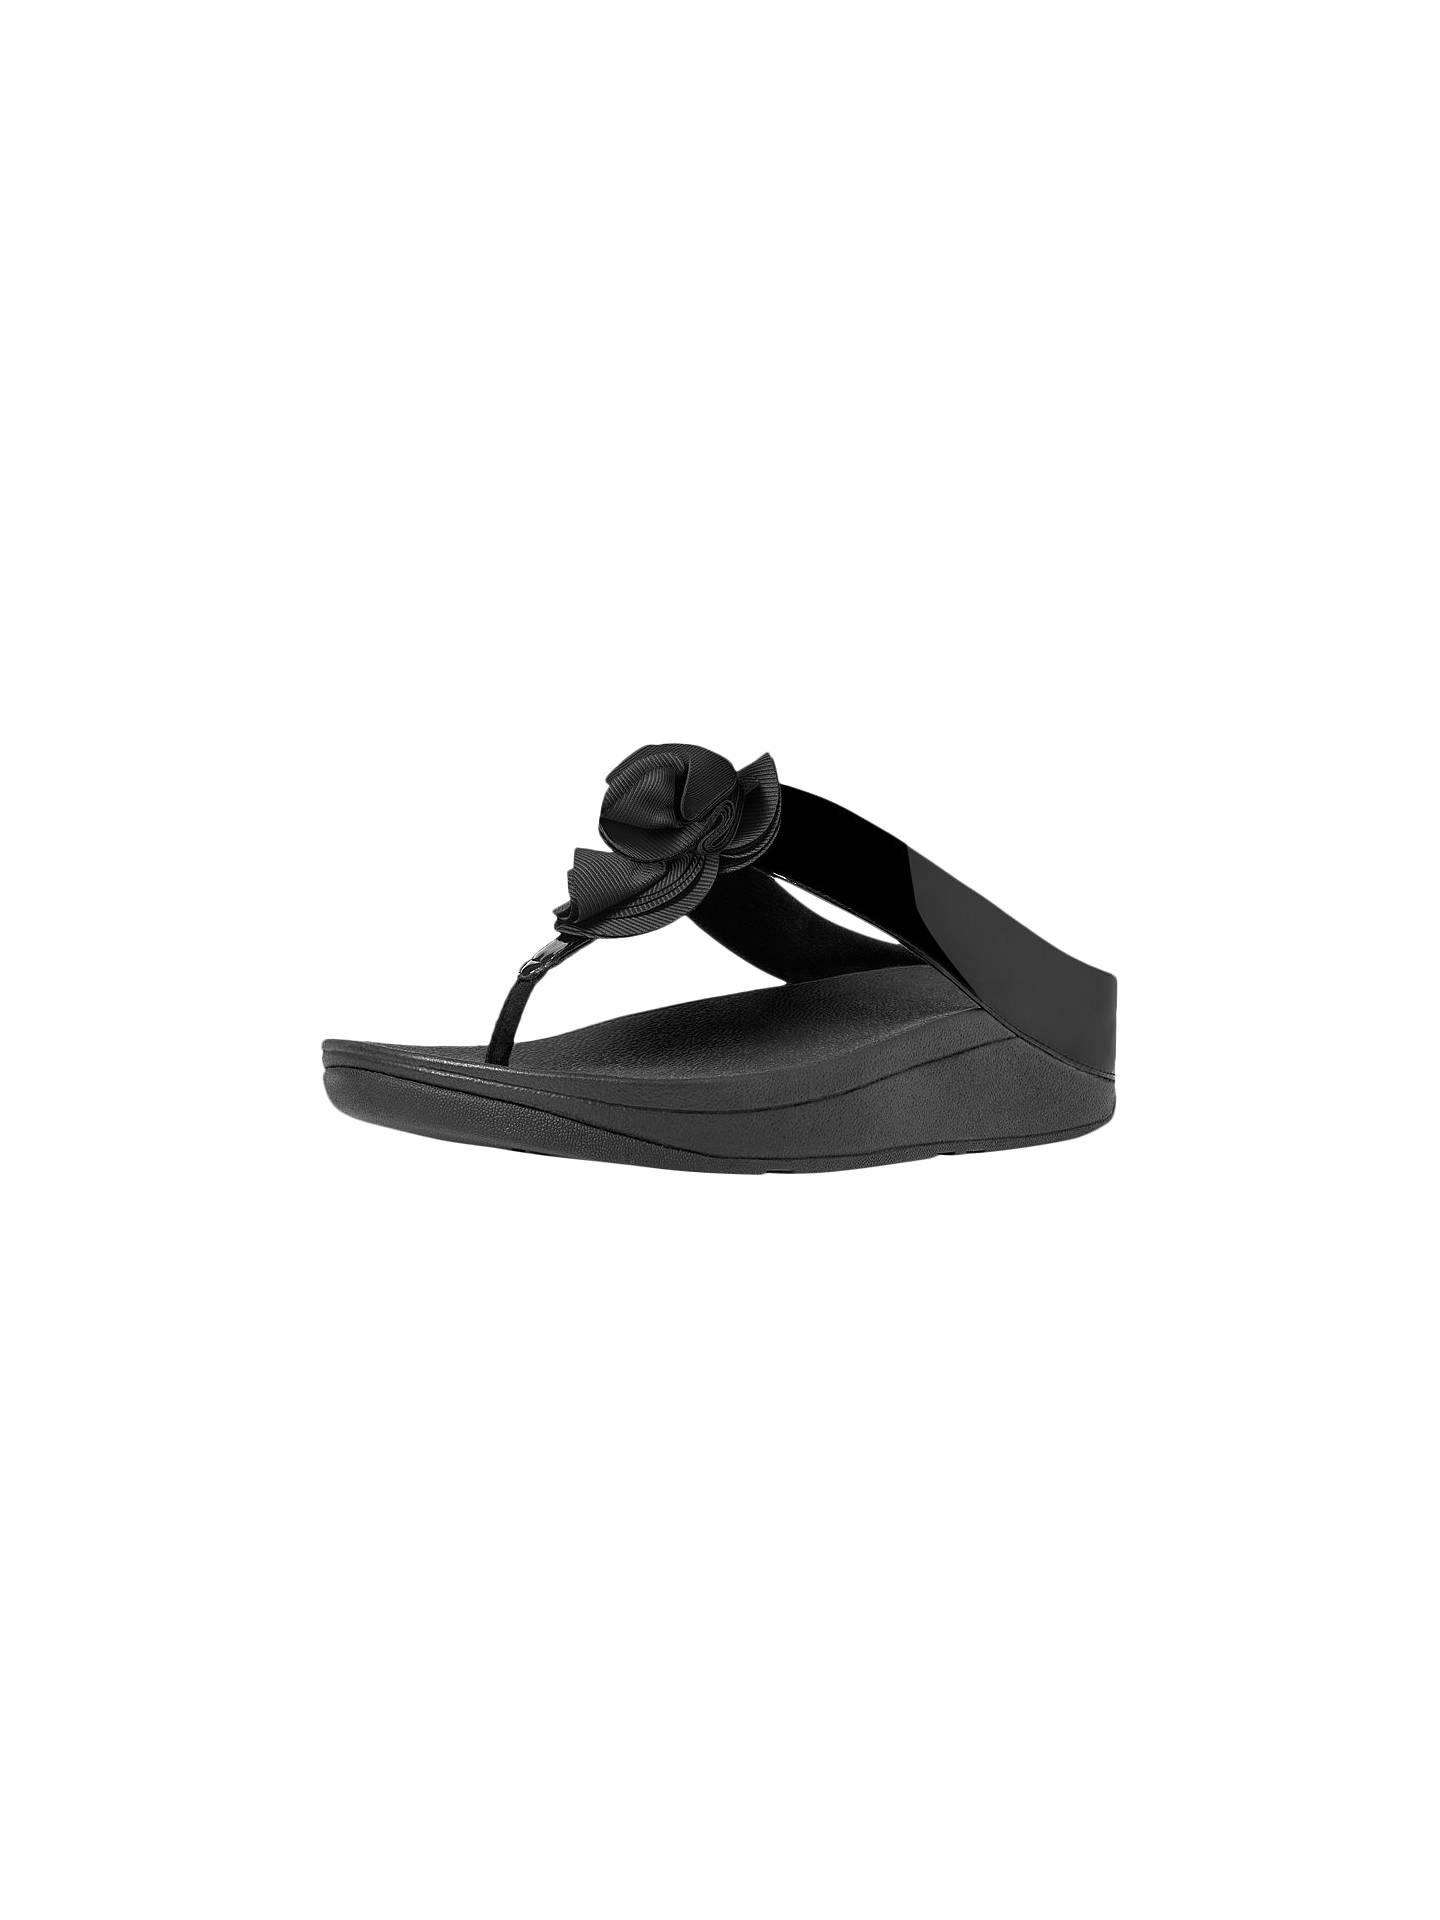 59cec4c224f6 Buy FitFlop Florrie Toe Post Sandals